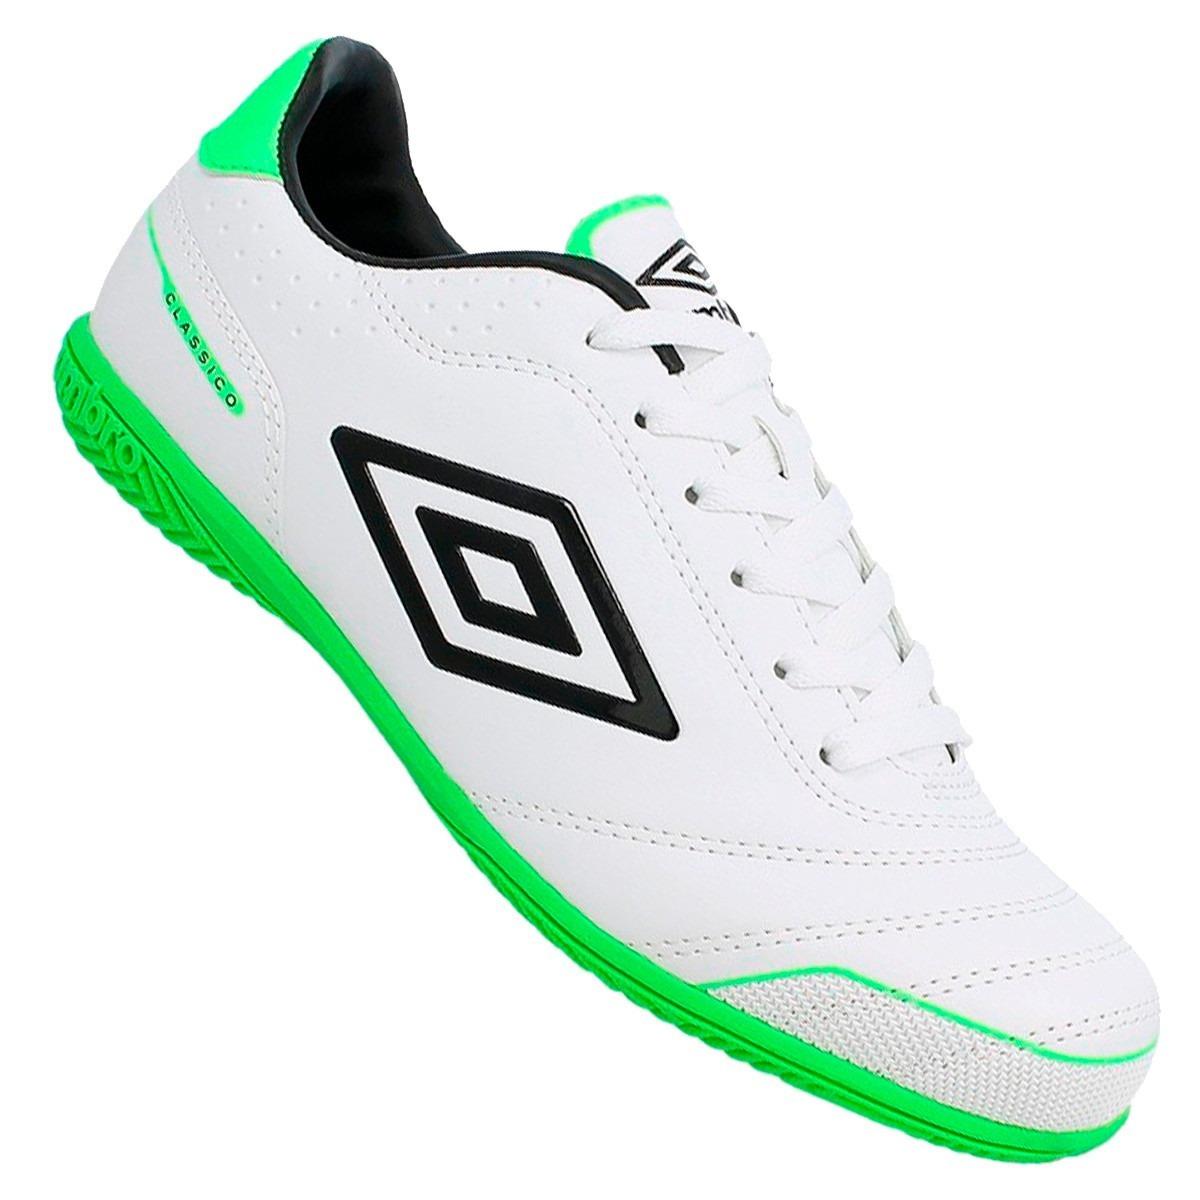 Botasdefutbolbaratasoutlet Zapatos Sala Umbro Futbol es BRBxqwFn ... 41f3020771589